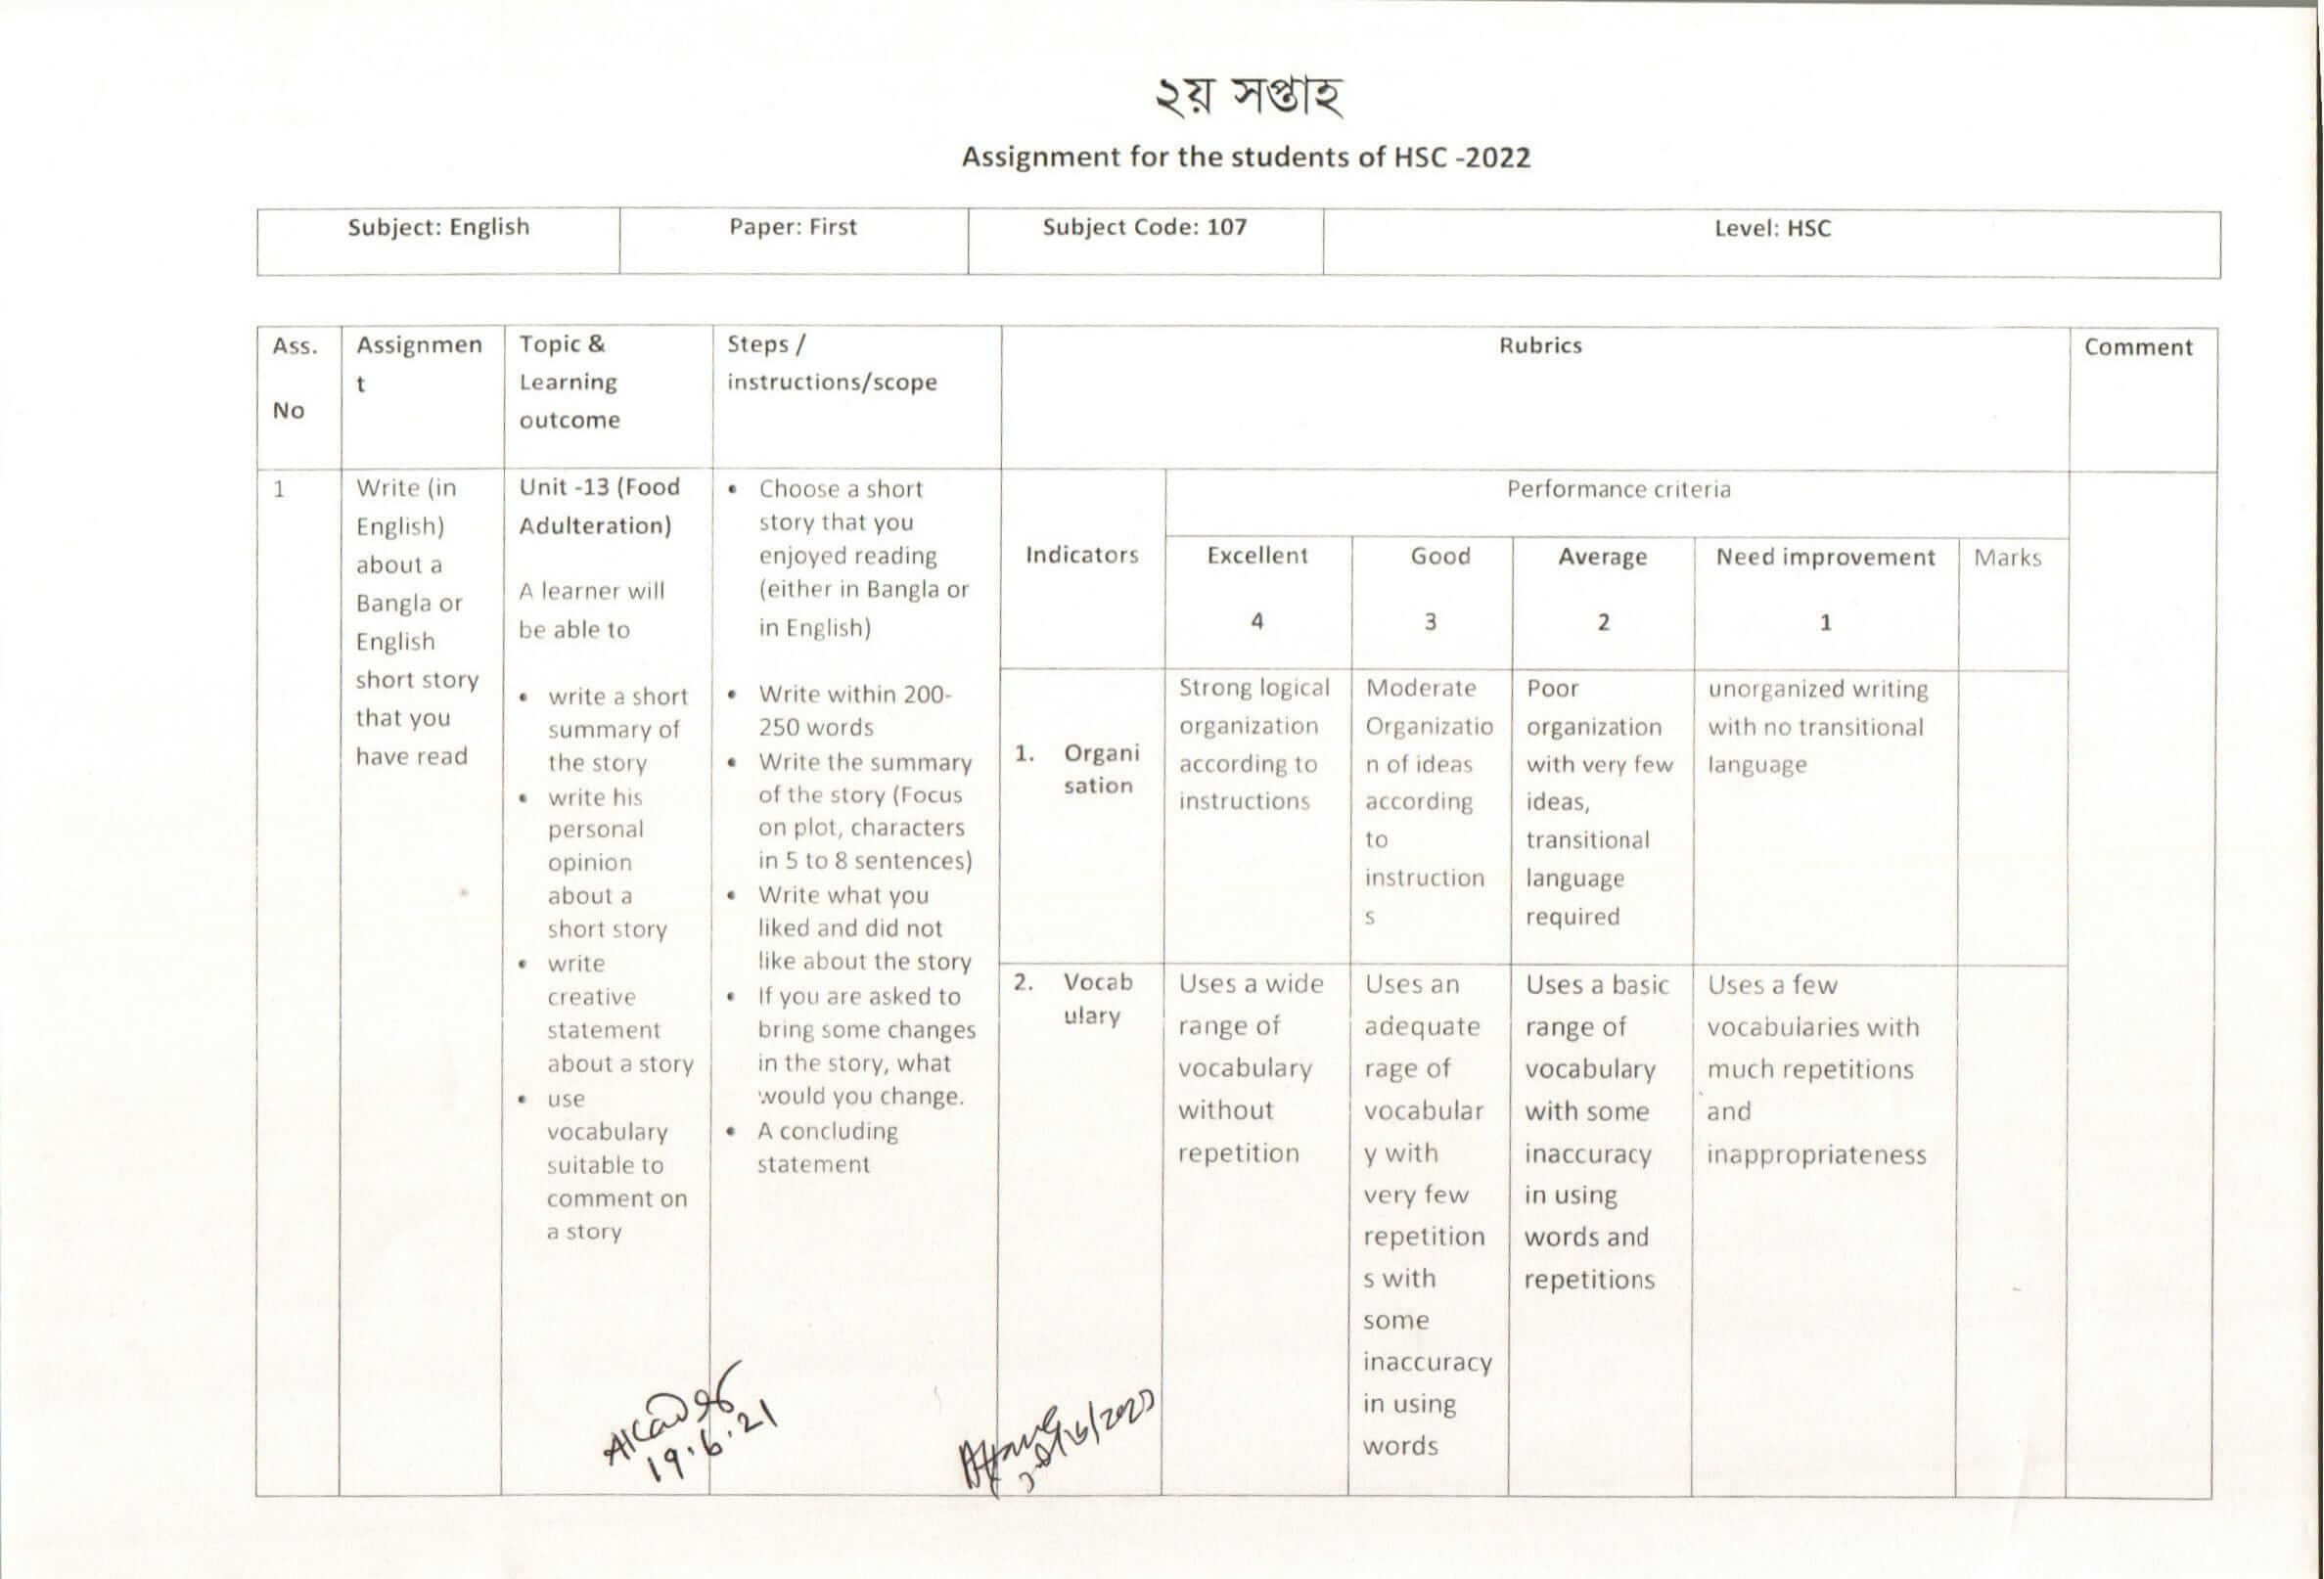 HSC Assignment 2022 English